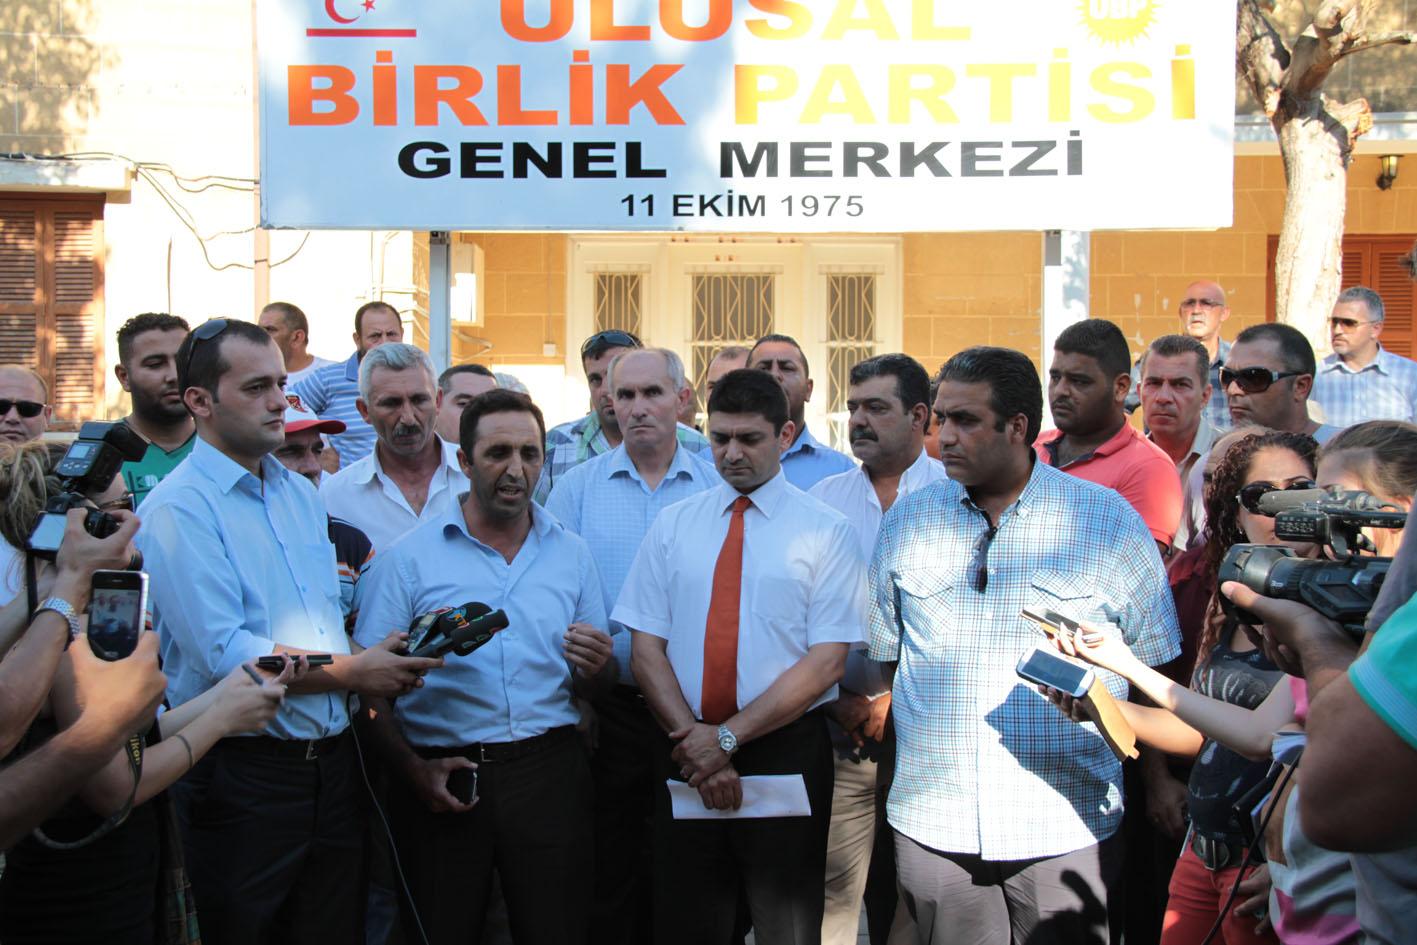 """KÜÇÜK GENEL BAŞKANLIK EHLİYETİNİ KAYBETTİ"""